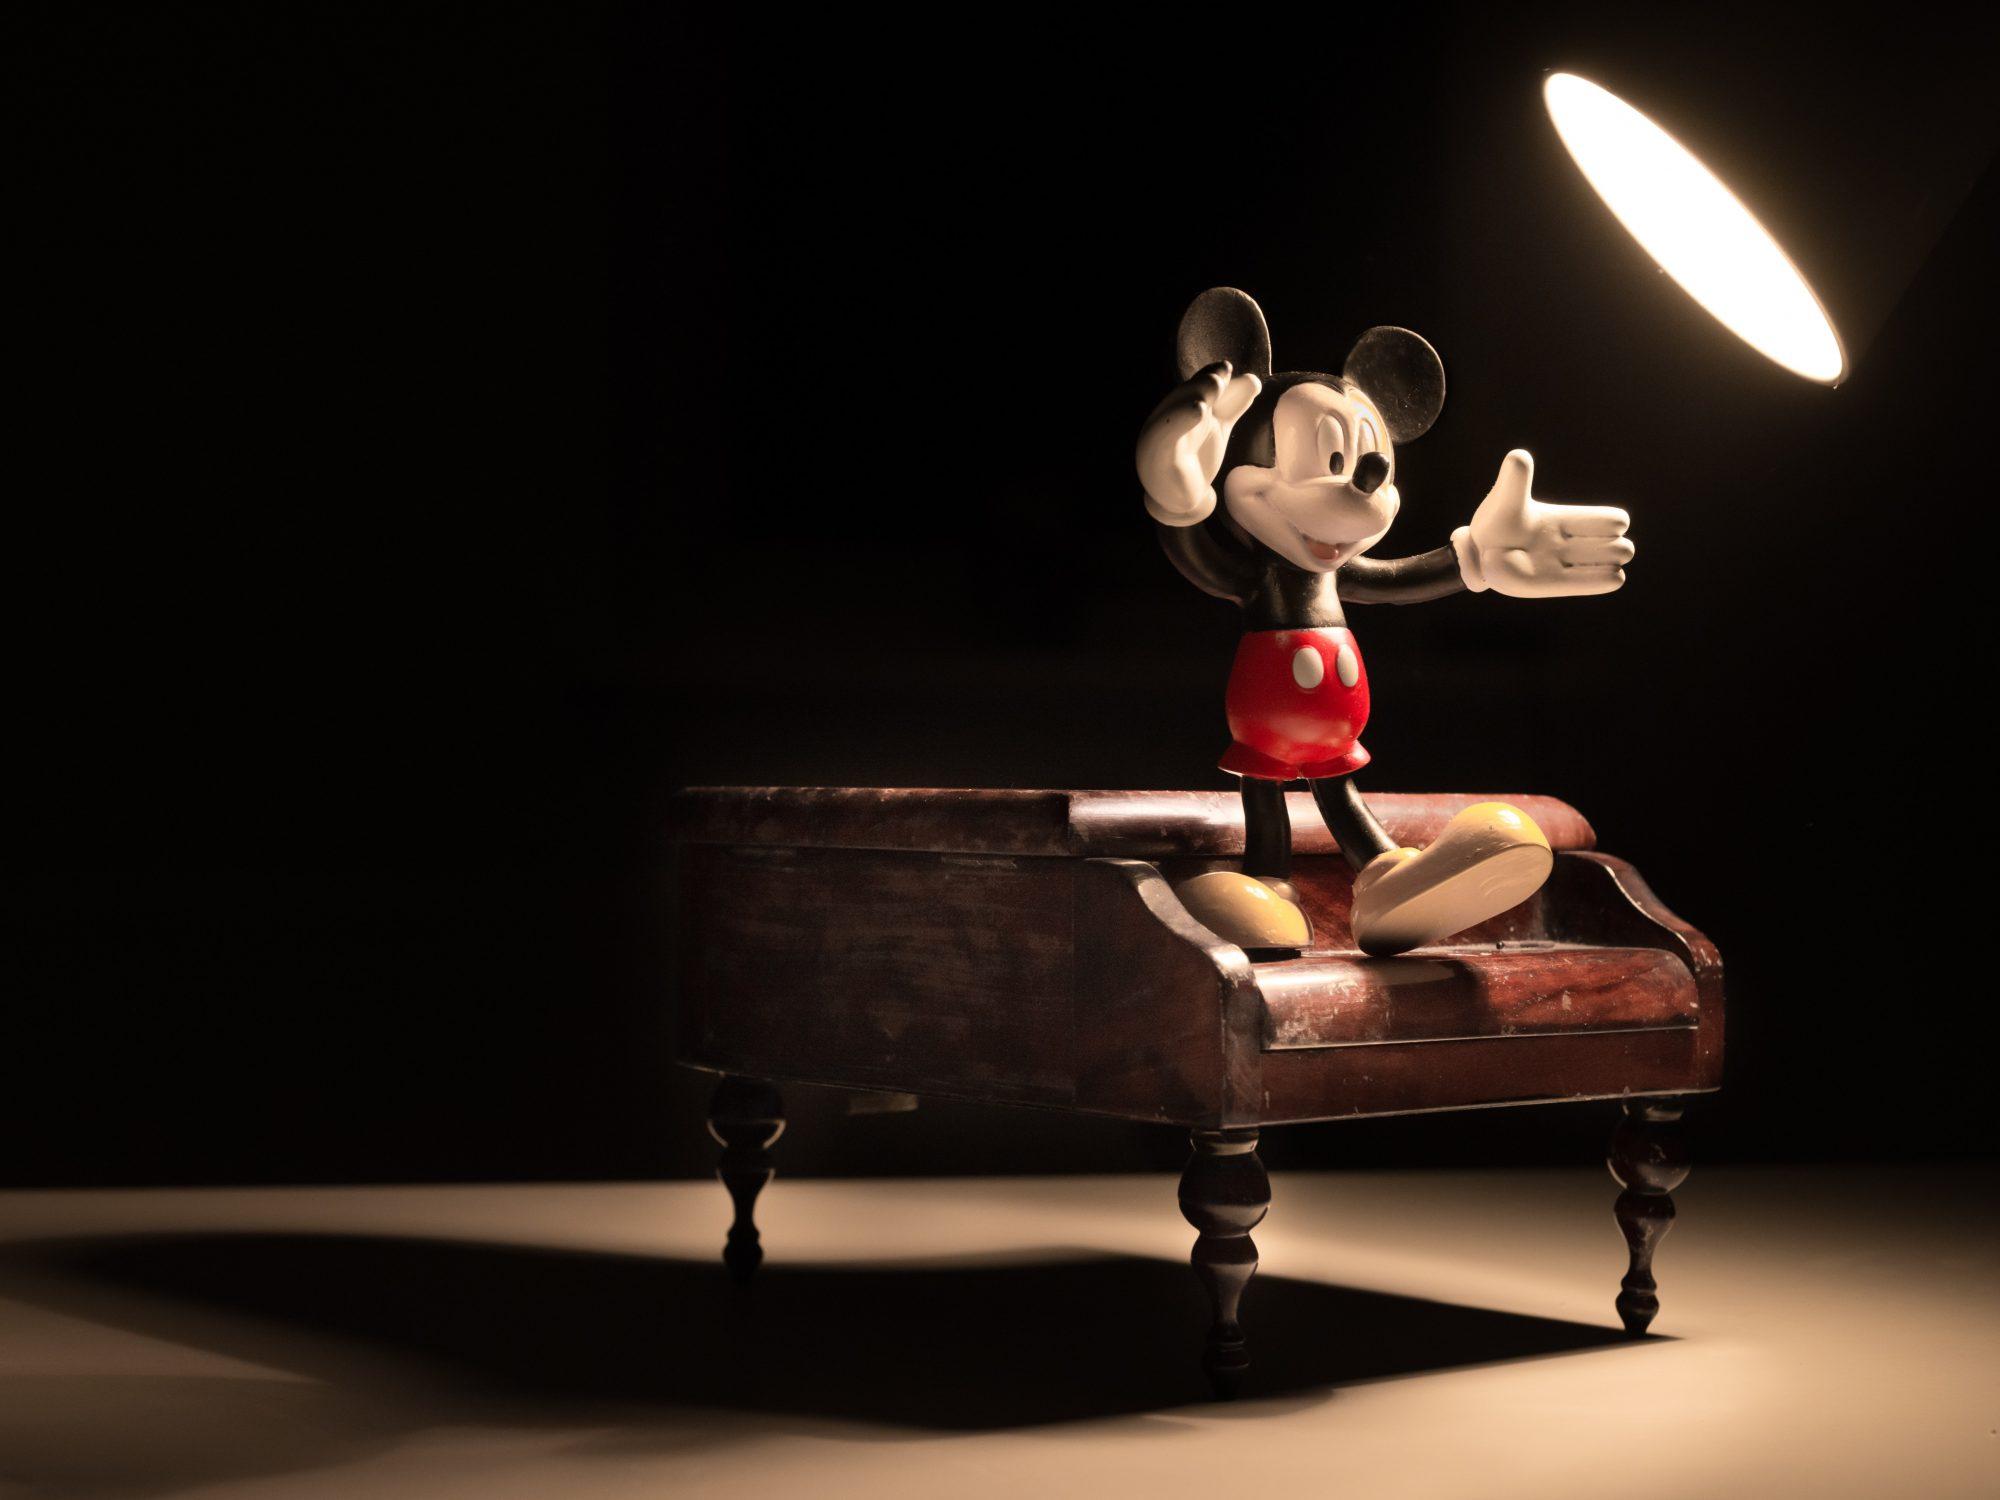 Mickey, l'as du dessin animé